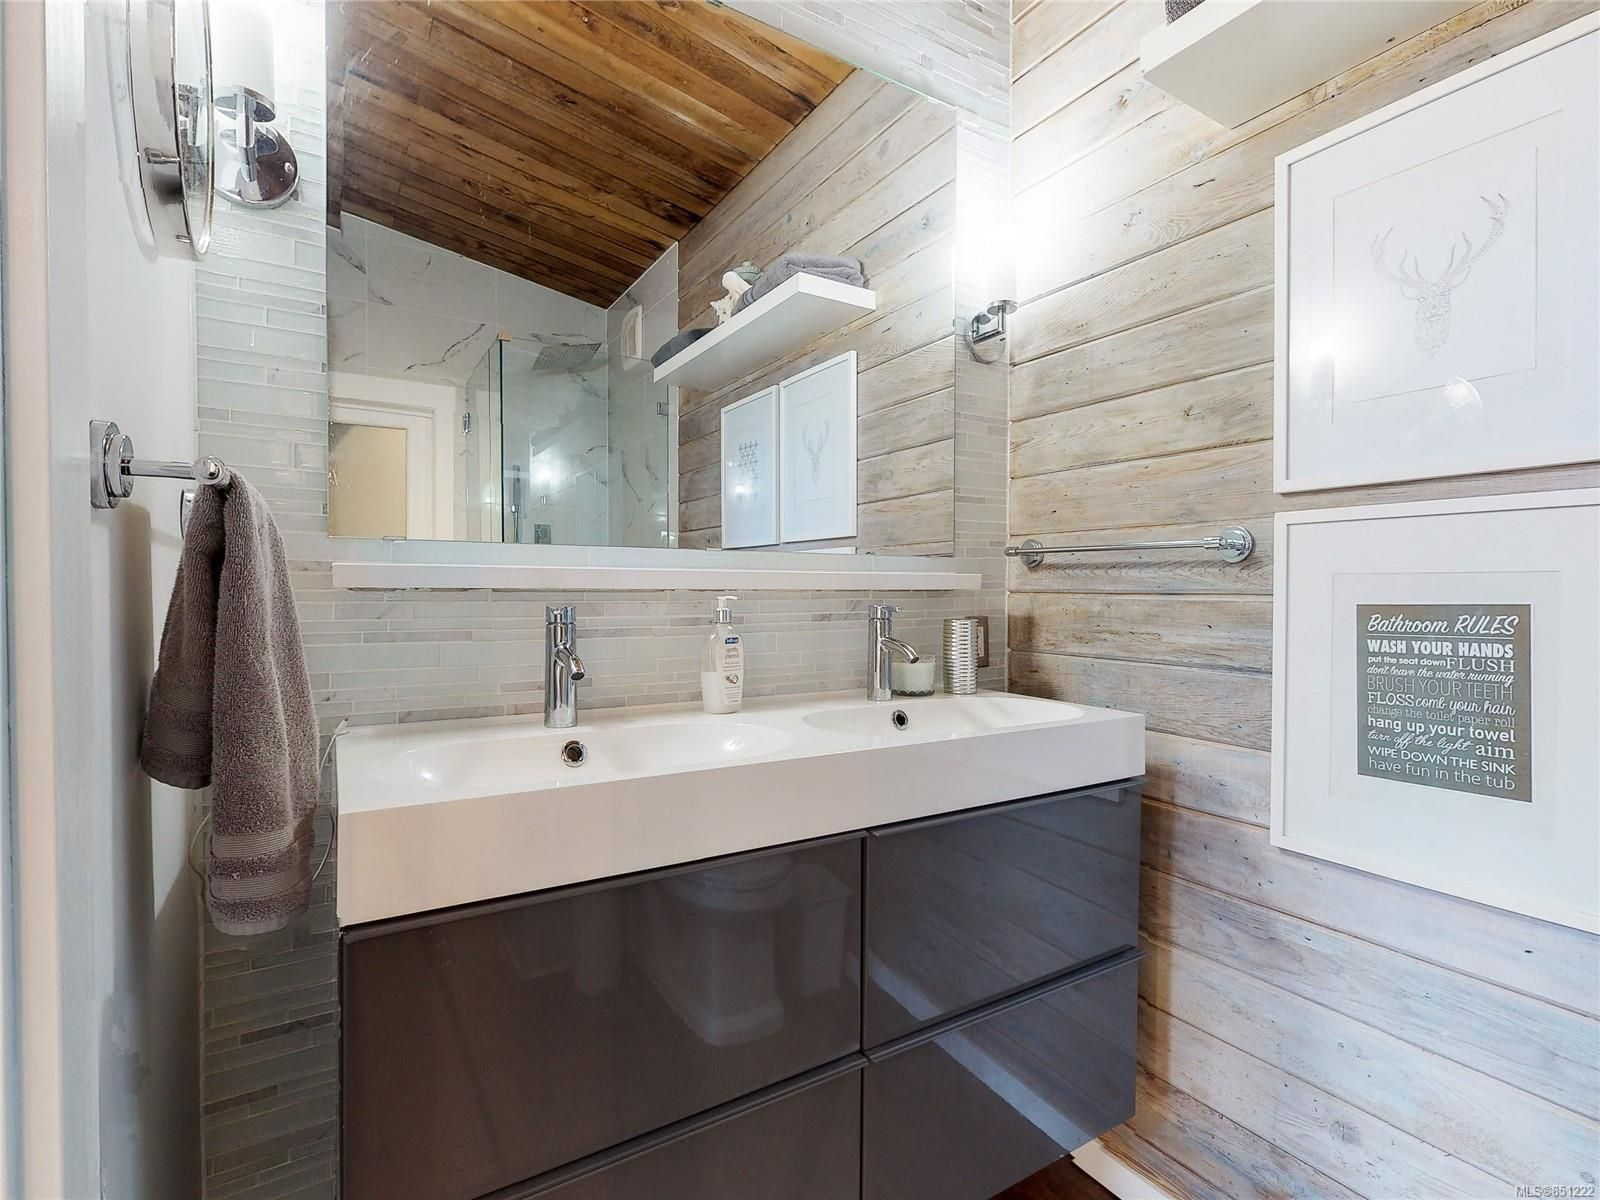 Photo 15: Photos: 2525 11th Ave in : PA Port Alberni House for sale (Port Alberni)  : MLS®# 851222